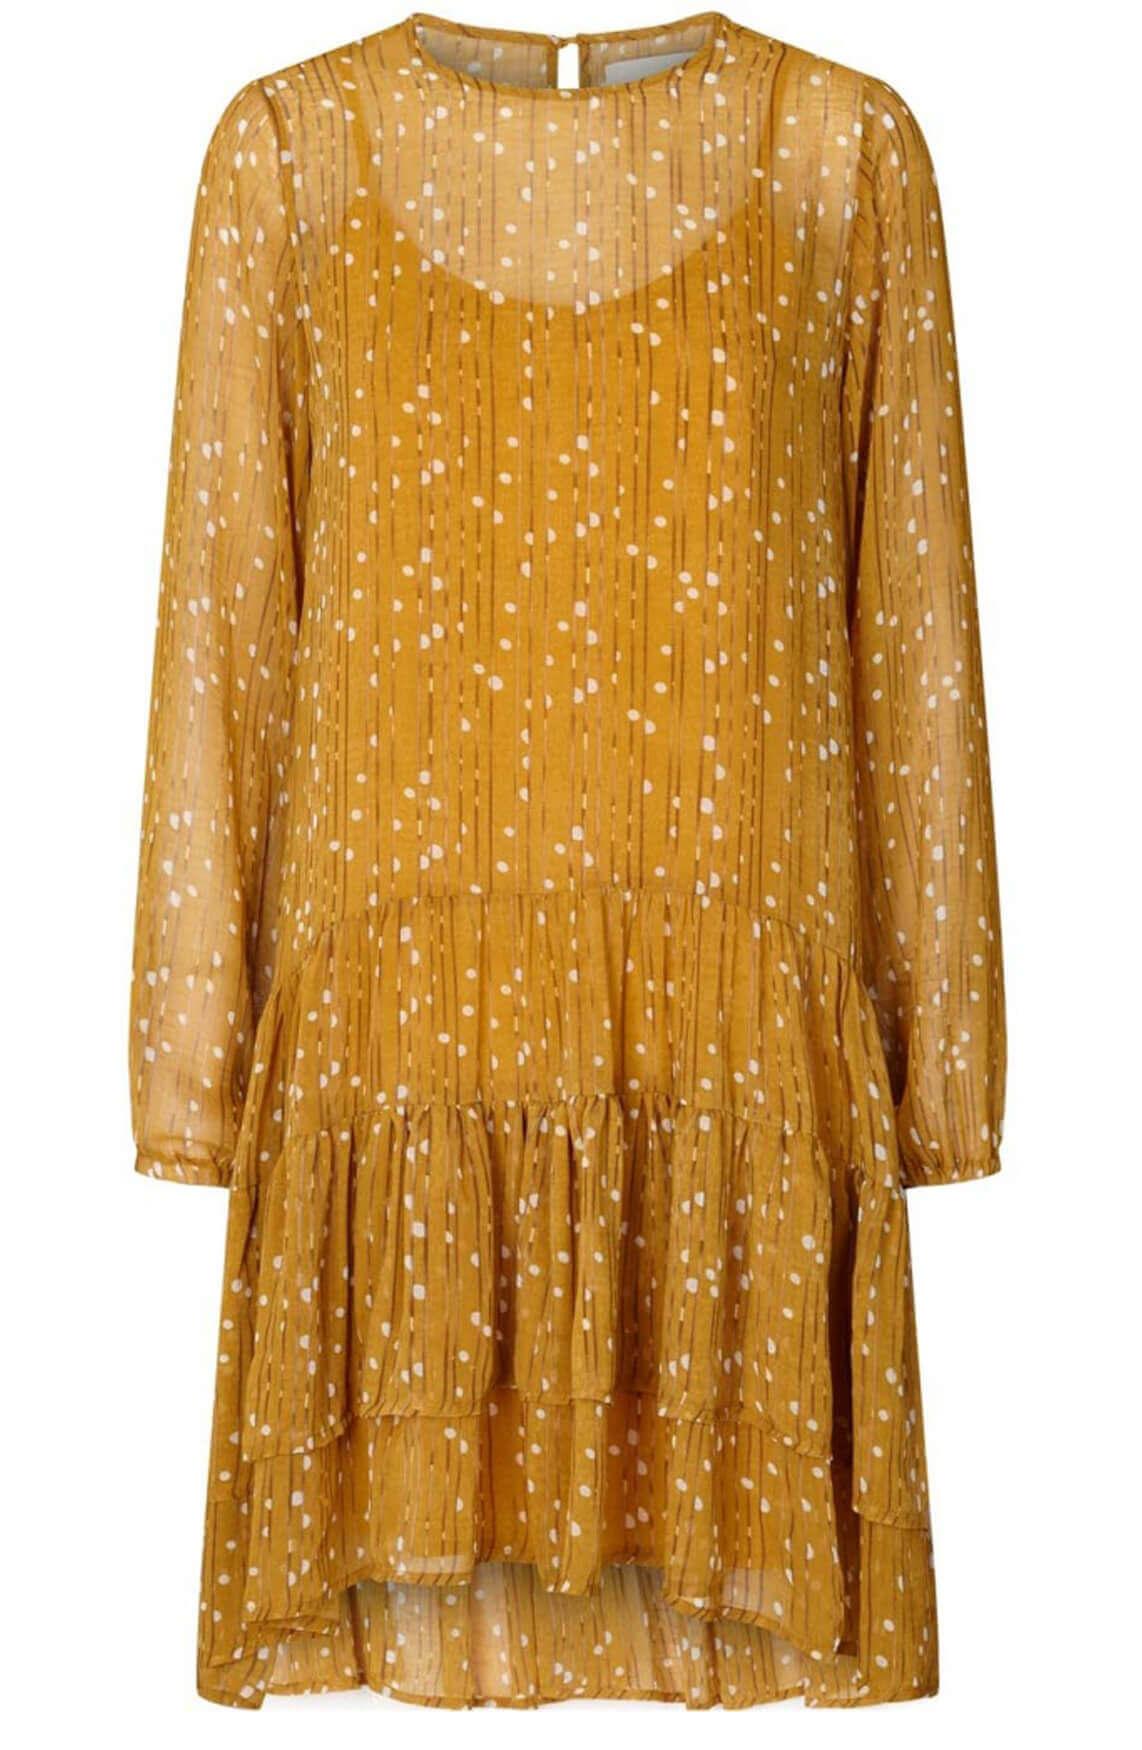 Lollys Laundry Dames Piper jurk geel